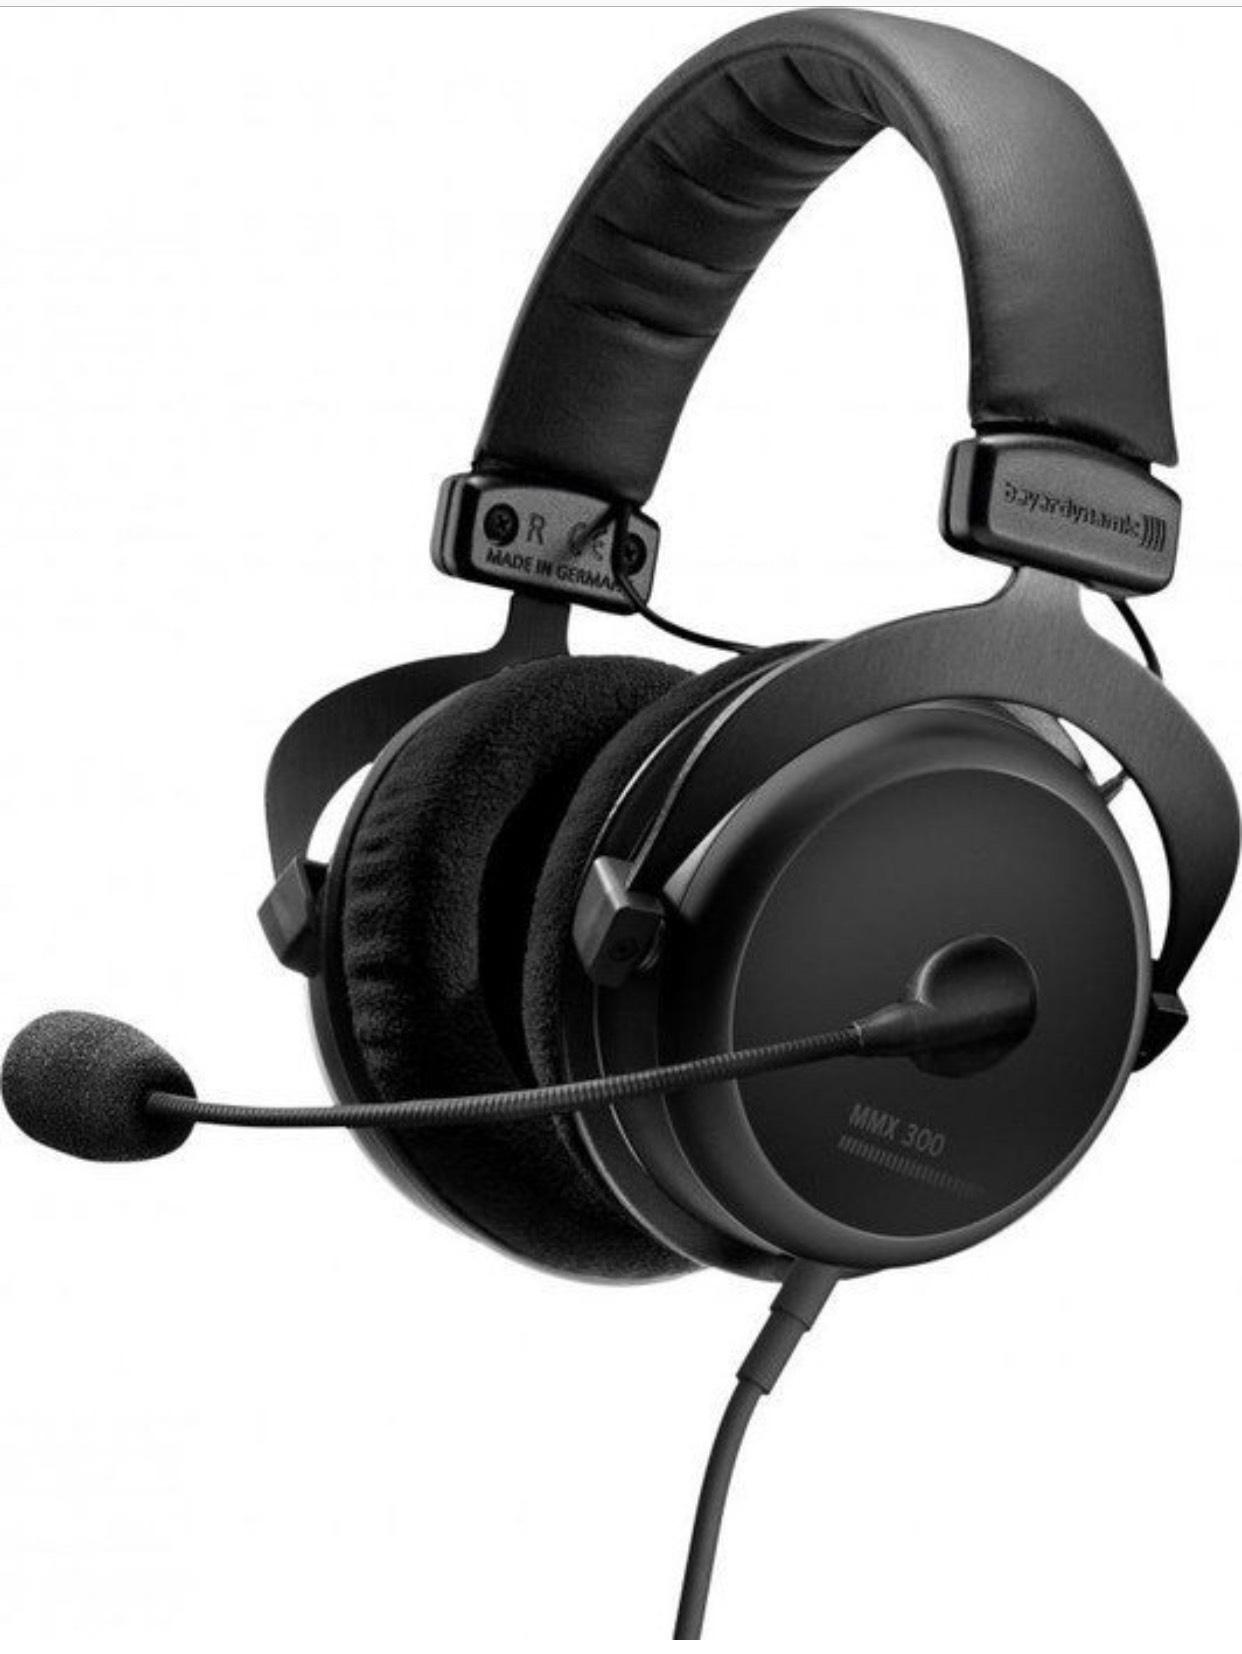 BEYERDYNAMIC Gaming-Kopfhörer MMX 300 (2. Generation) für 199,99€